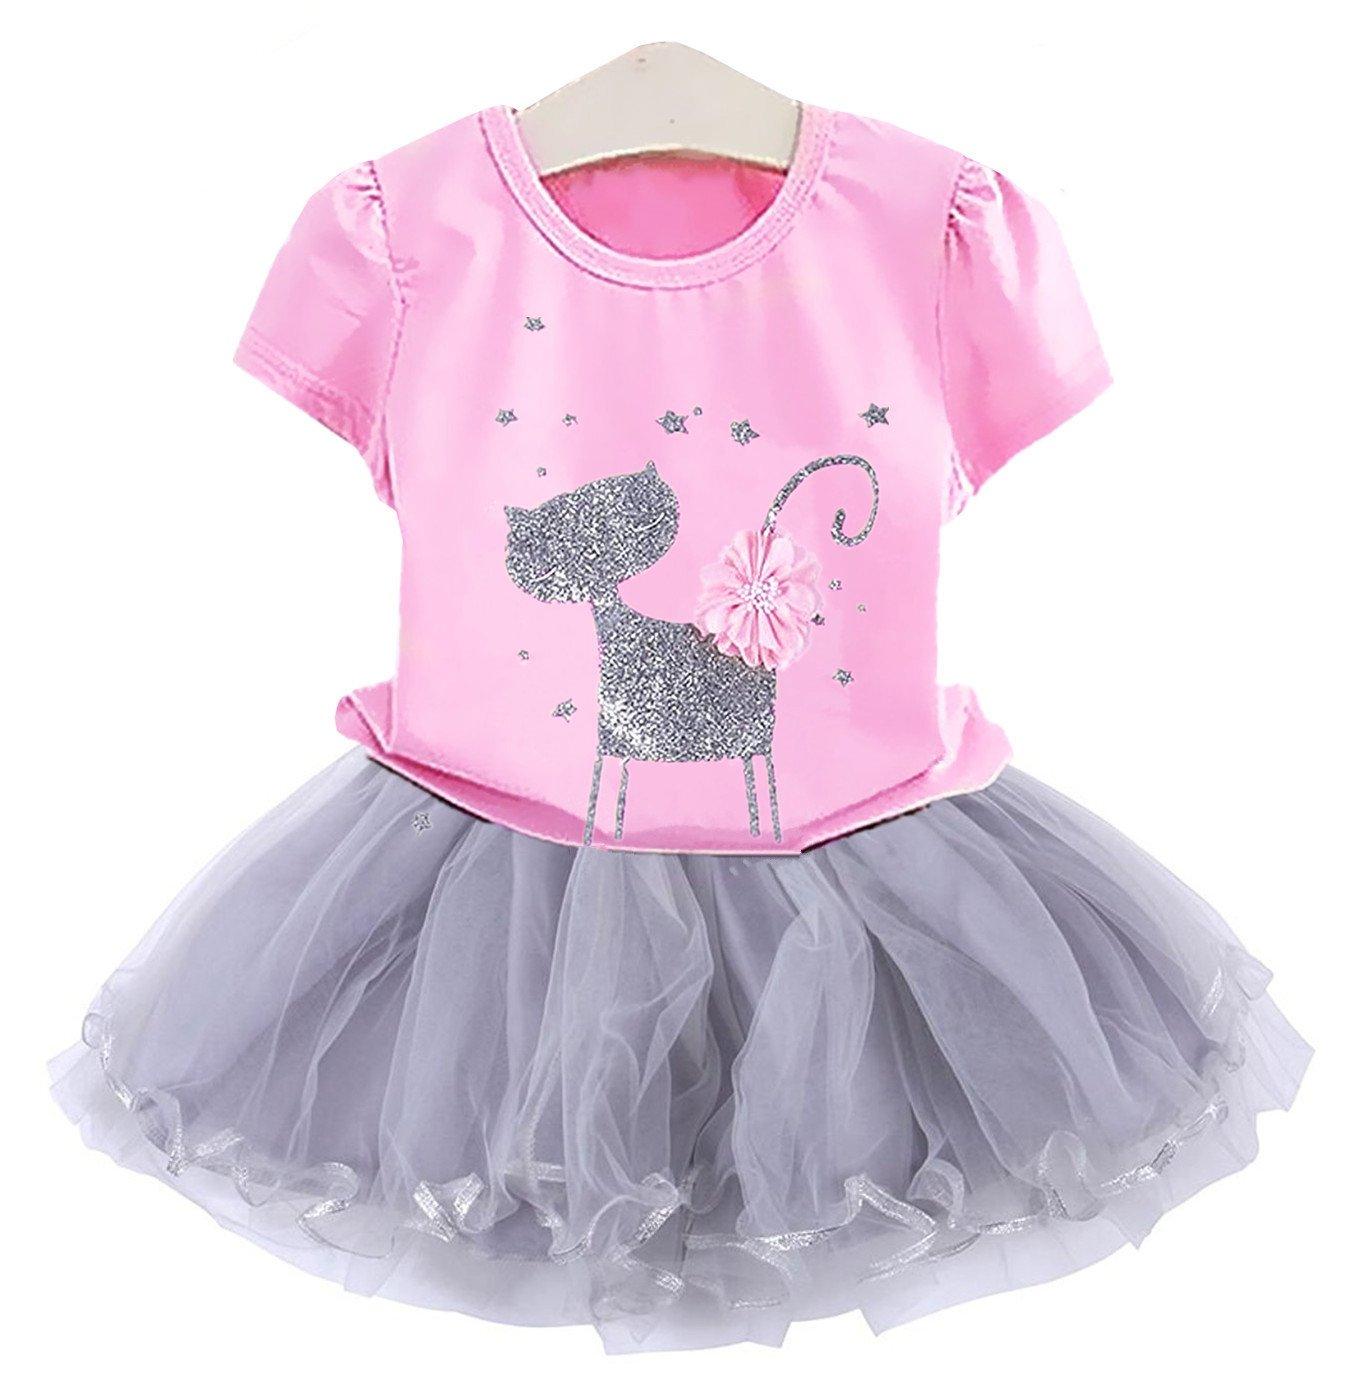 2Bunnies Girl Cat 3D Sequin Bow Sparkle Tutu Butterfly Tulle Skirt Dress Sets (4T, Bubblegum Pink)